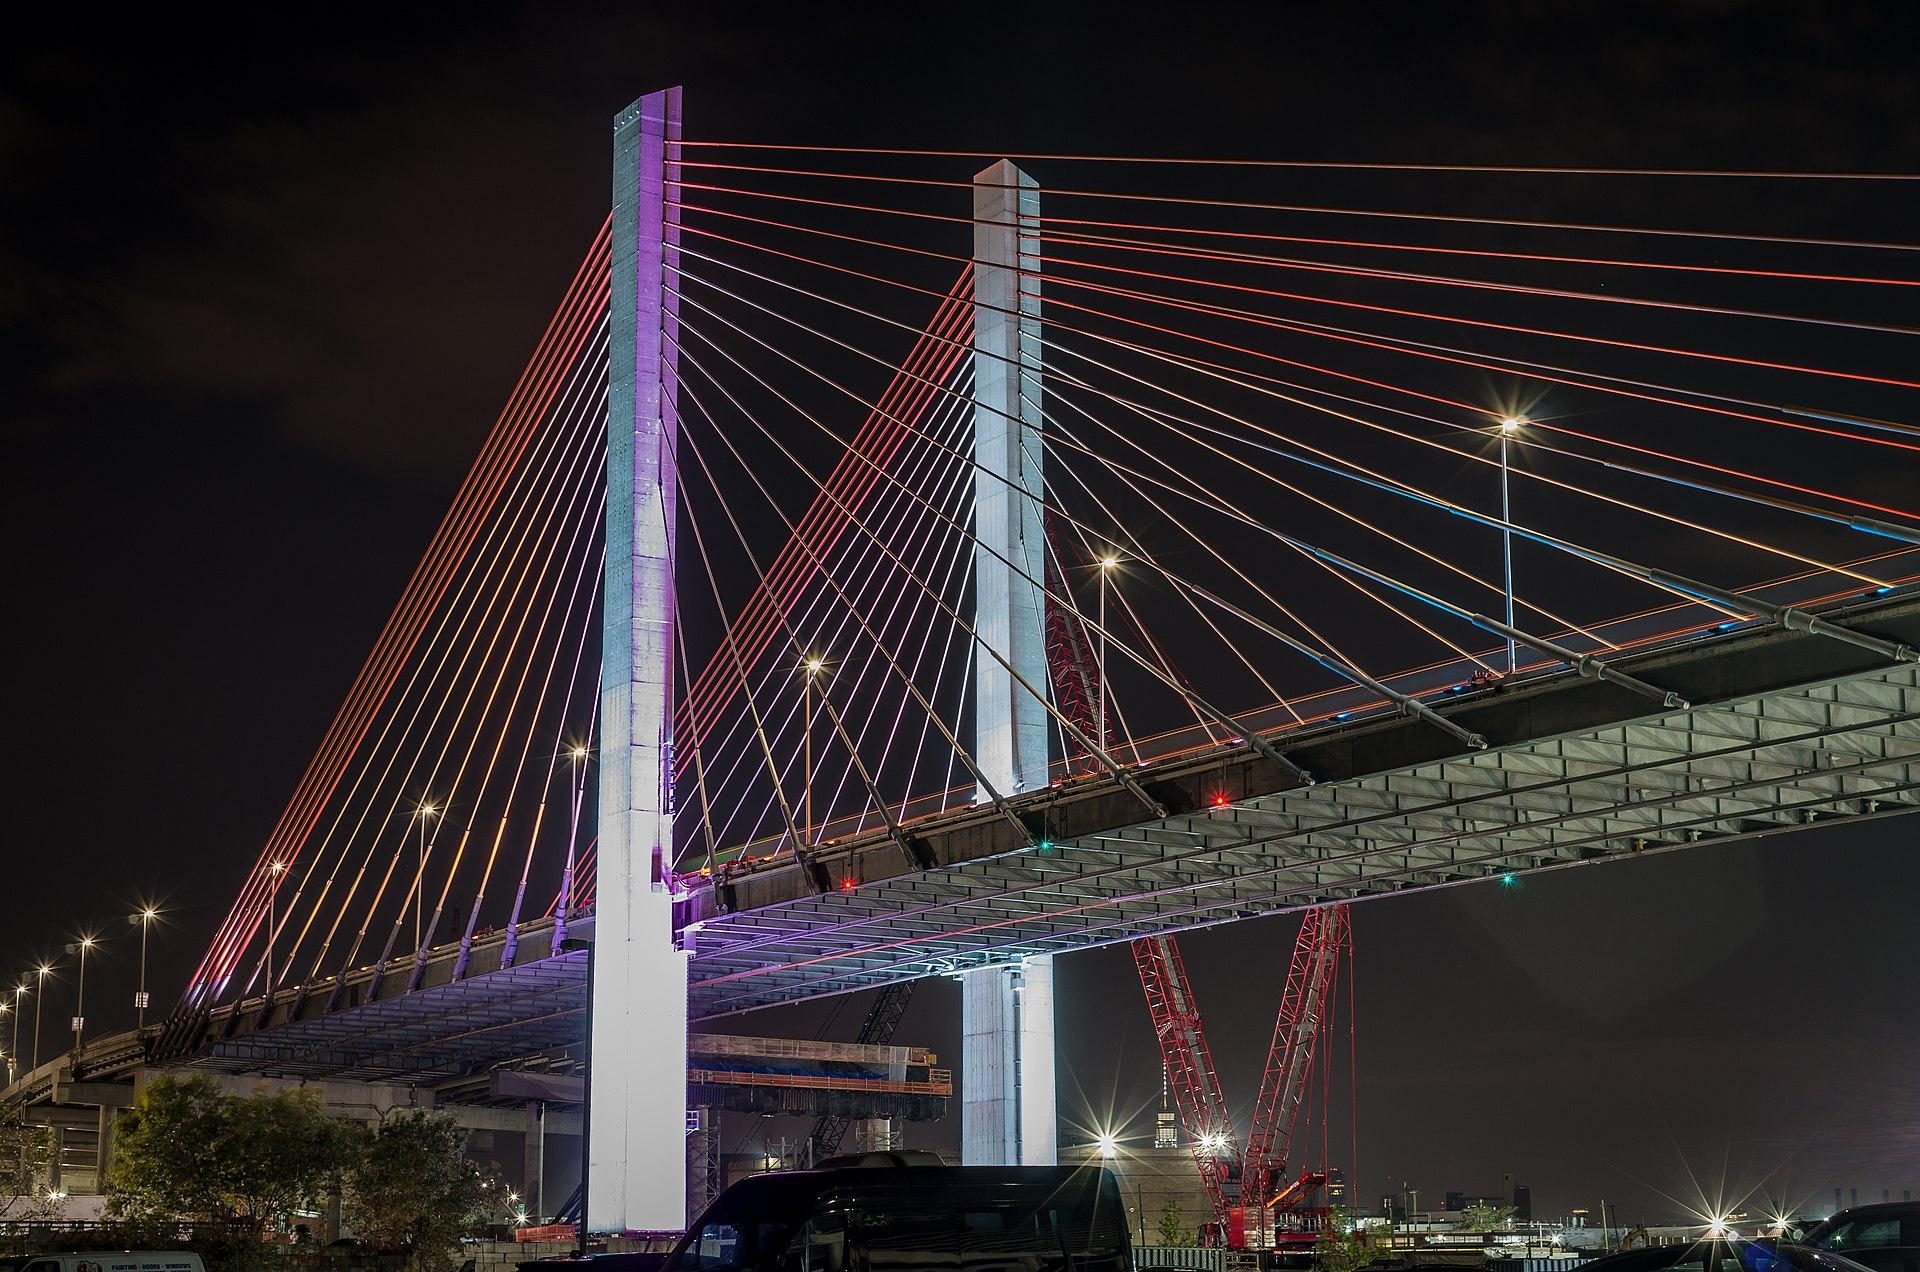 The Kosciuszko Bridge links Long Island City with Brooklyn. Photo by edom31 via Wikimedia Commons